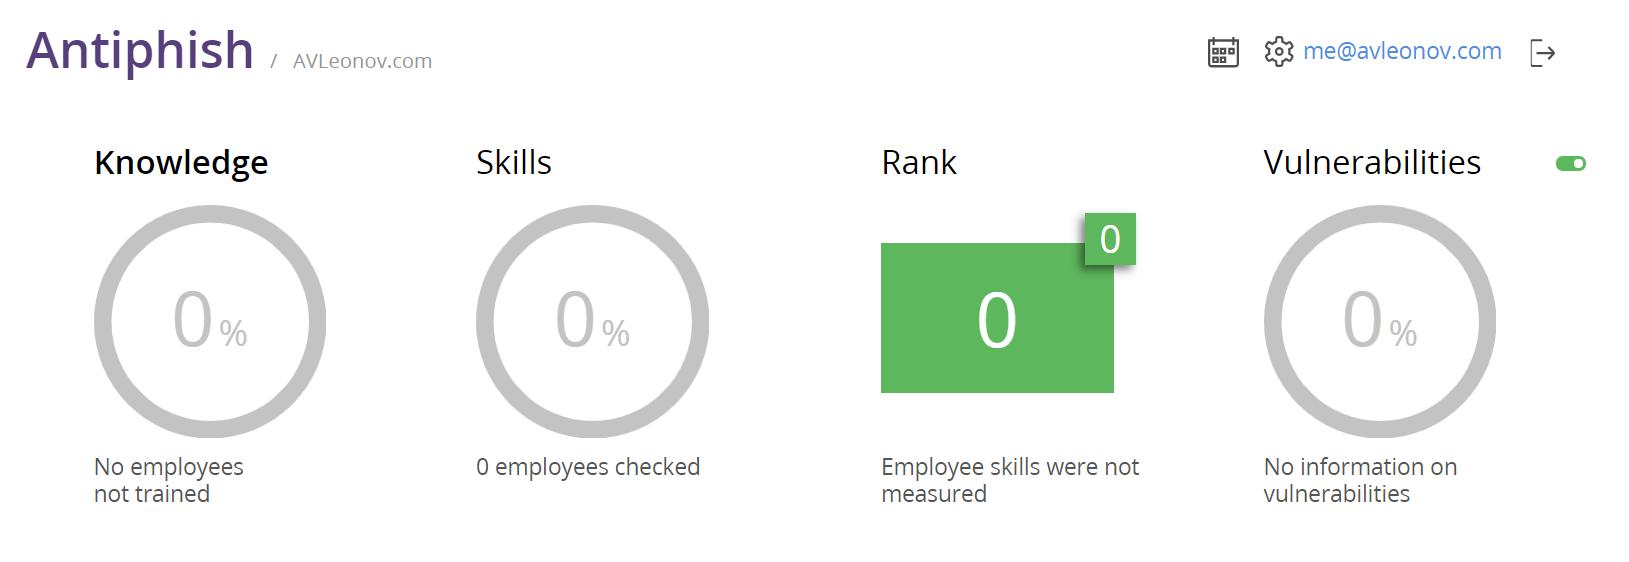 Antiphish dashboard: Knowledge, Skills, Rank, Vulnerabilities